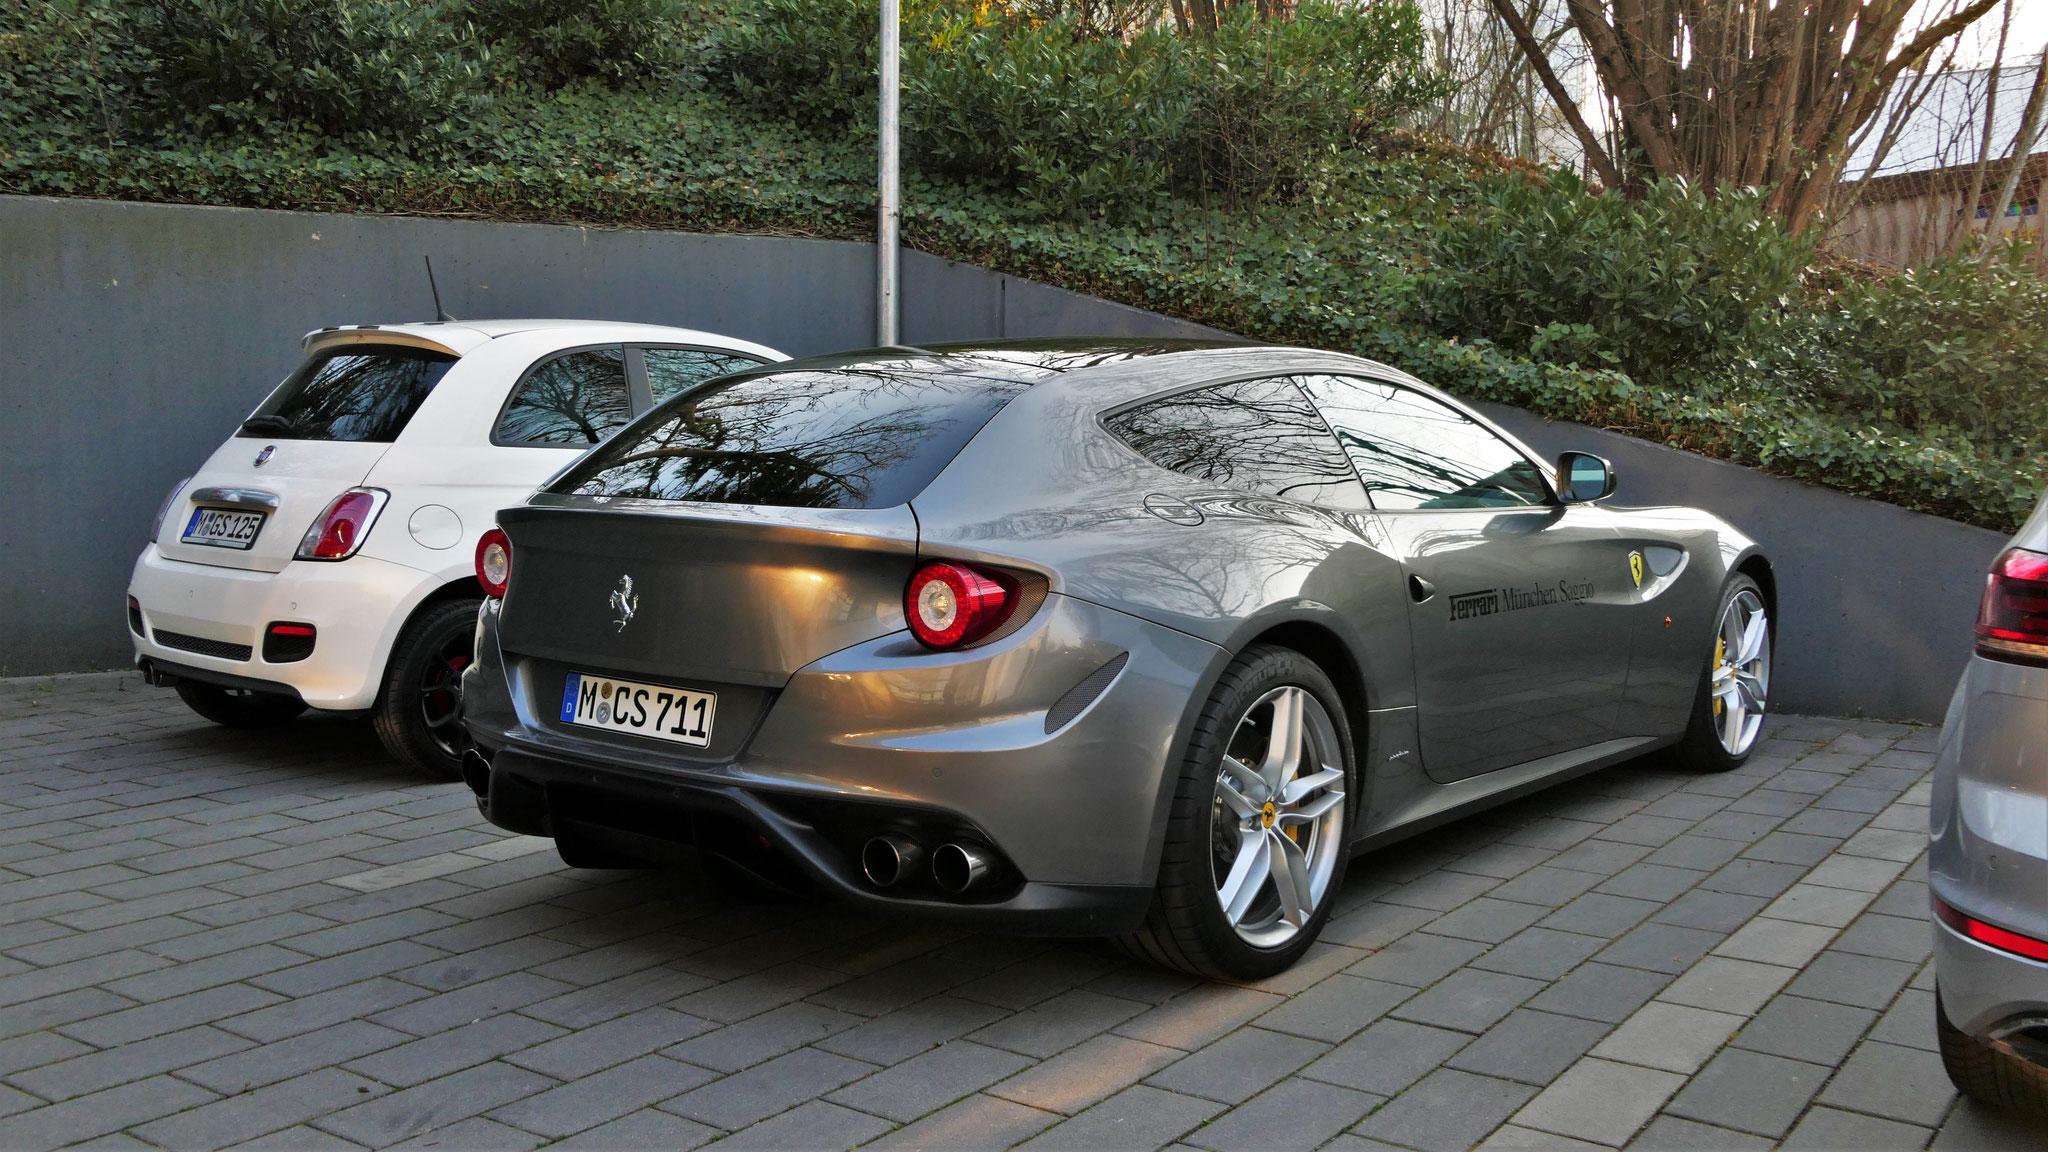 Ferrari FF - M-CS-711